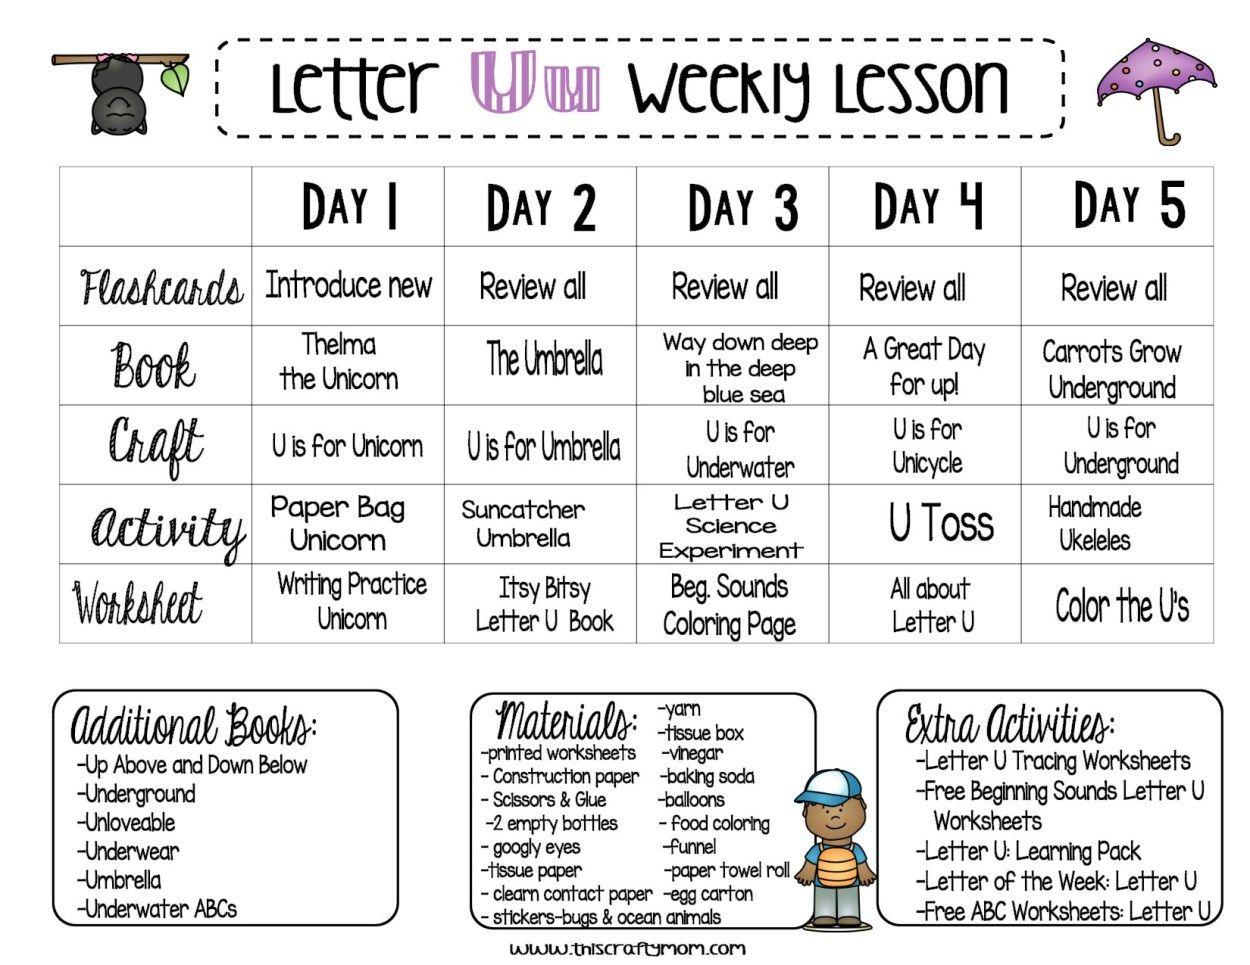 Letter U Free Preschool Weekly Lesson Plan Letter Of